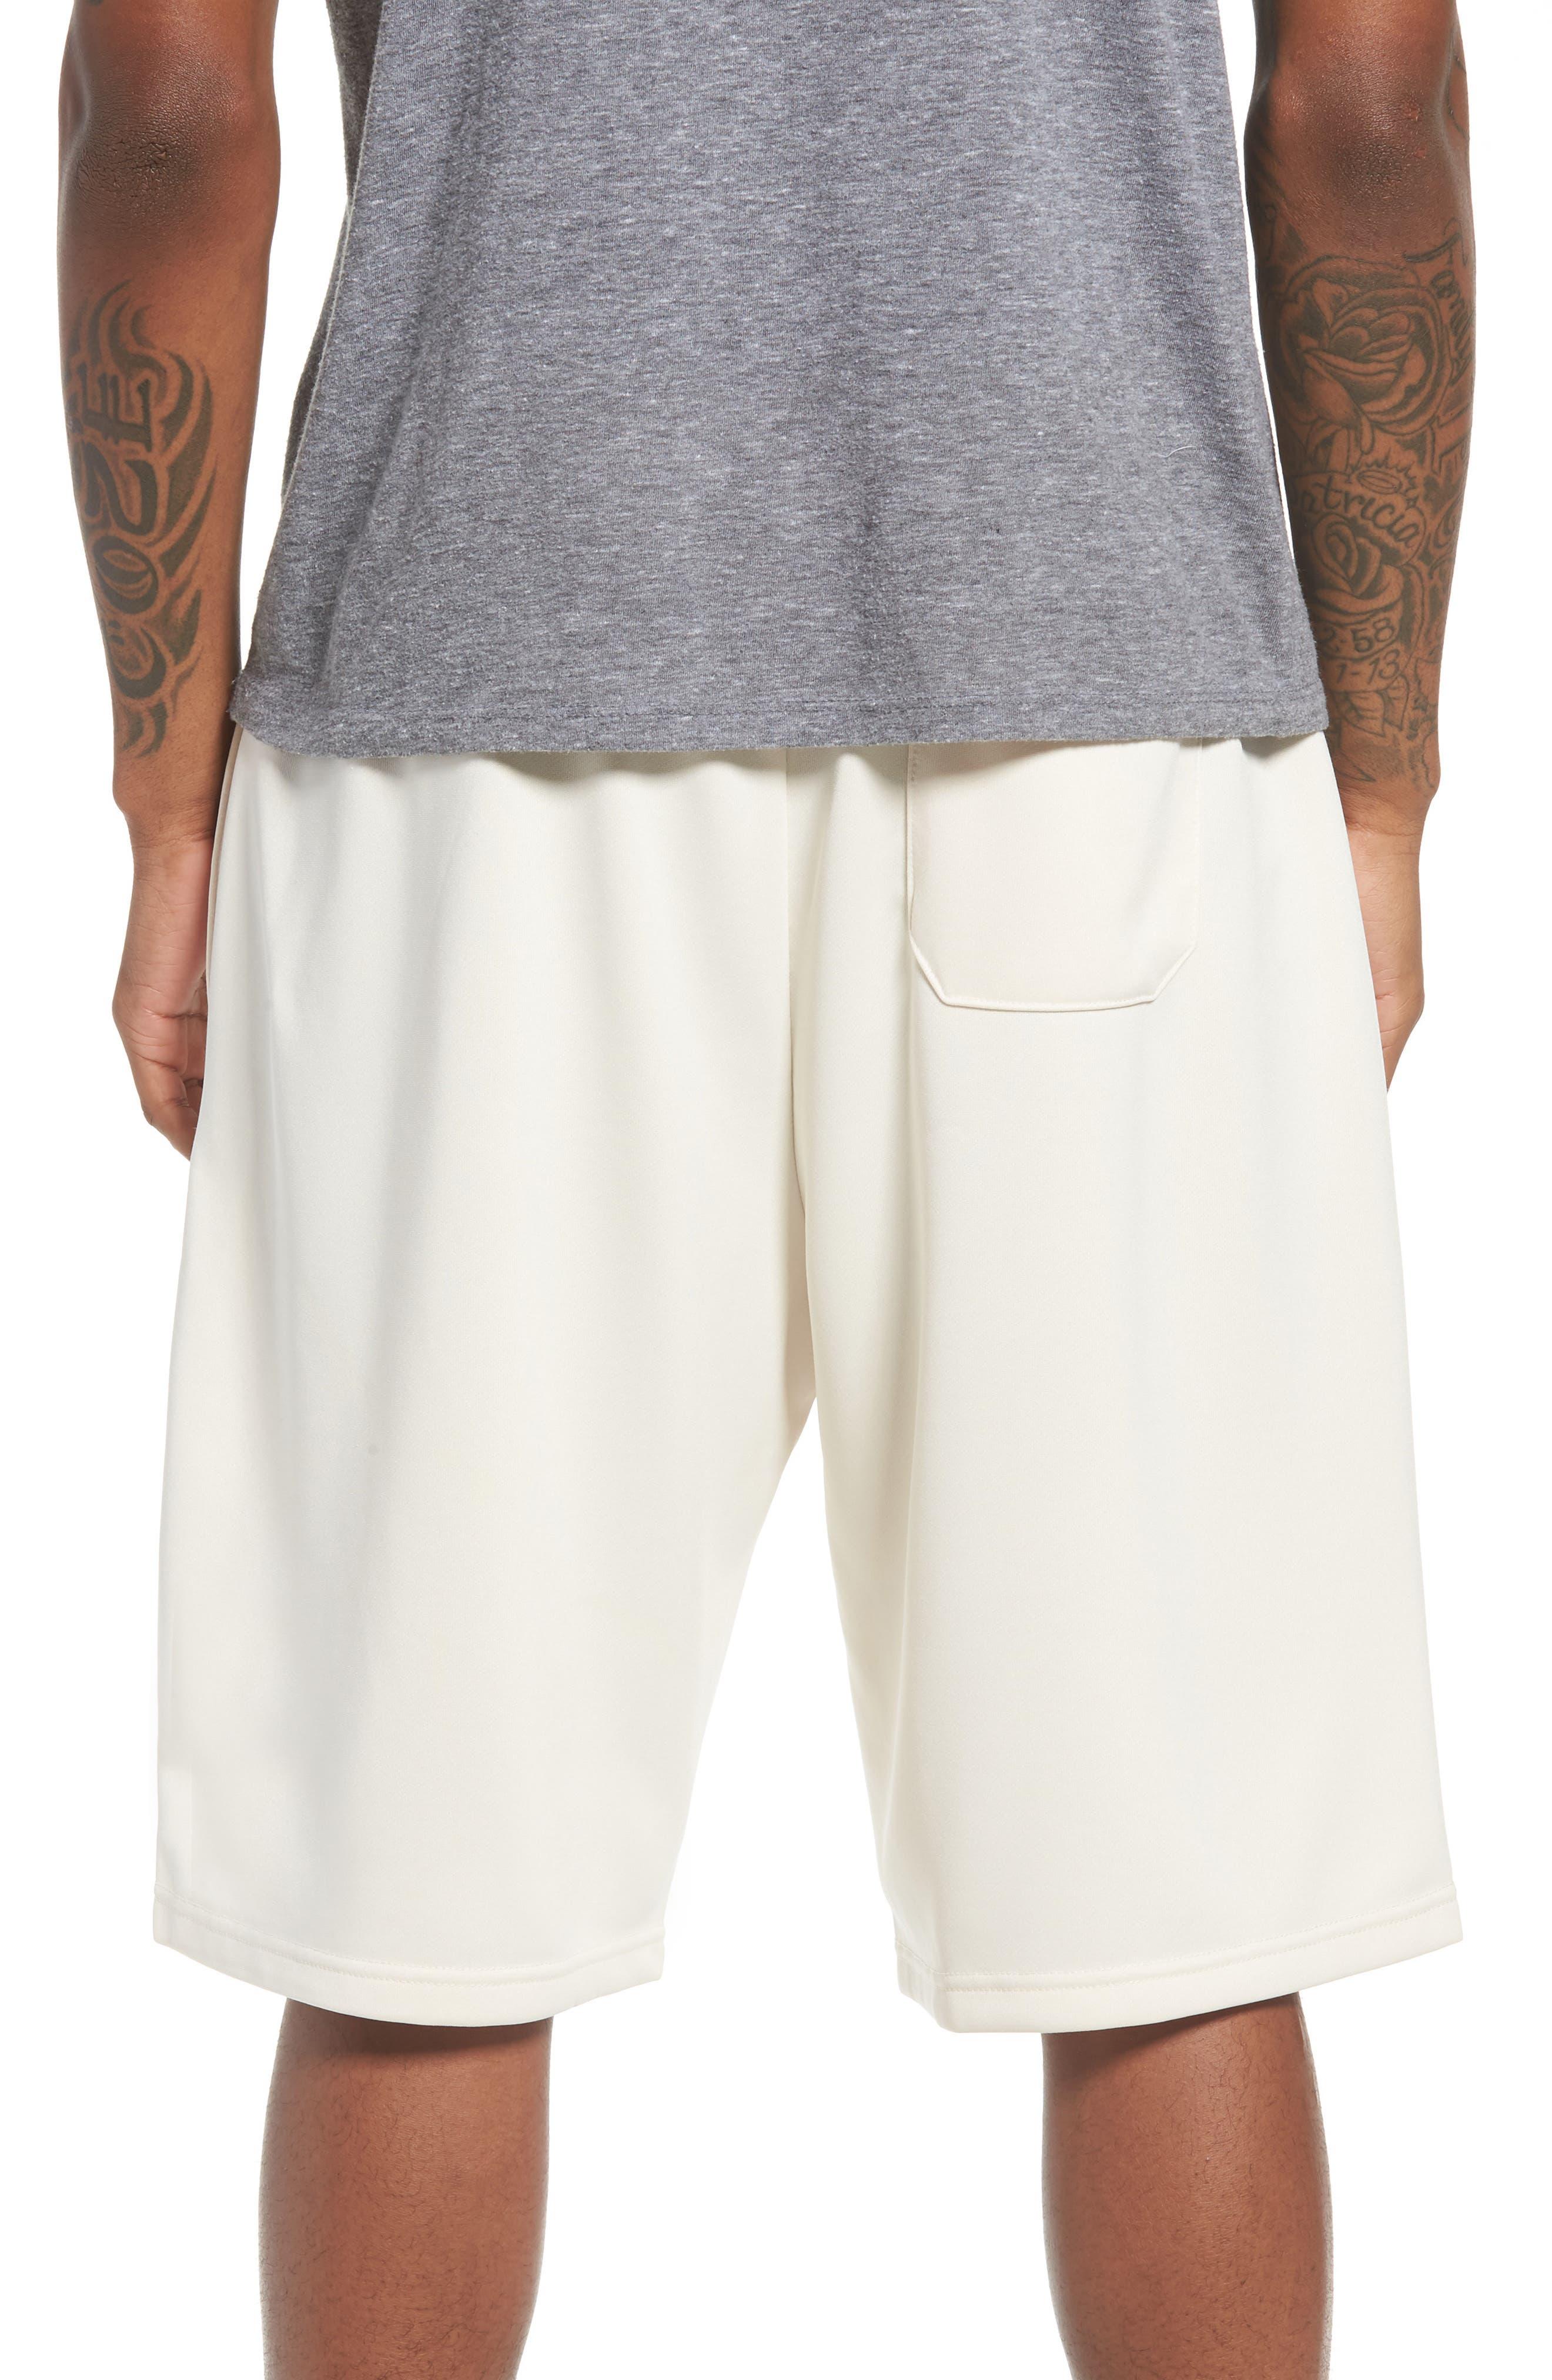 Dominico Shorts,                             Alternate thumbnail 2, color,                             130